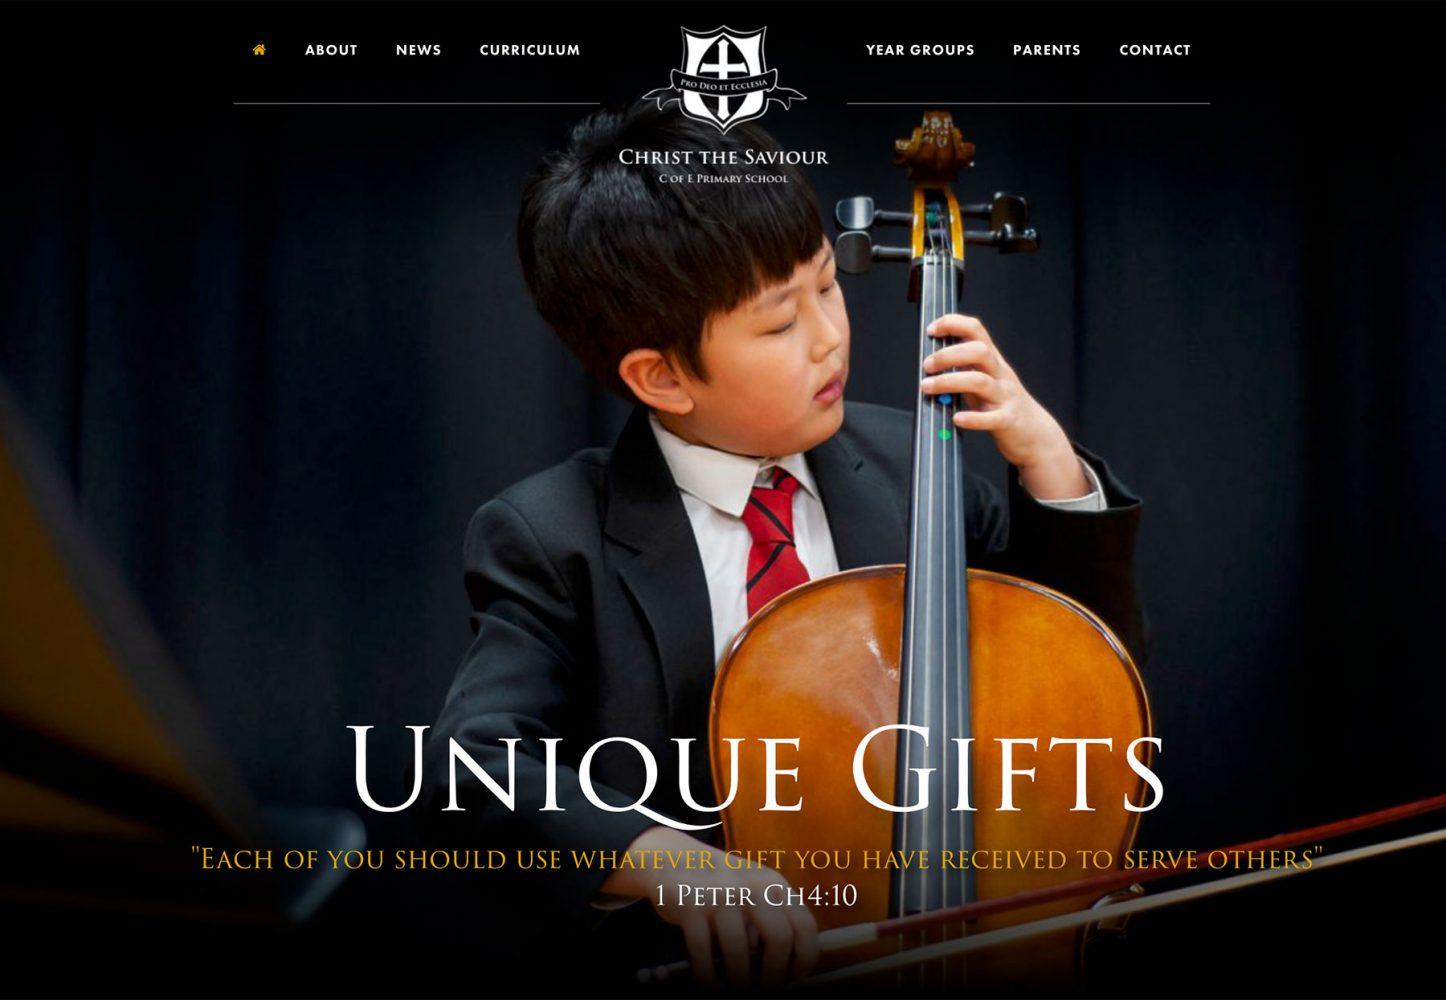 Christ the Saviour School website homepage photograph